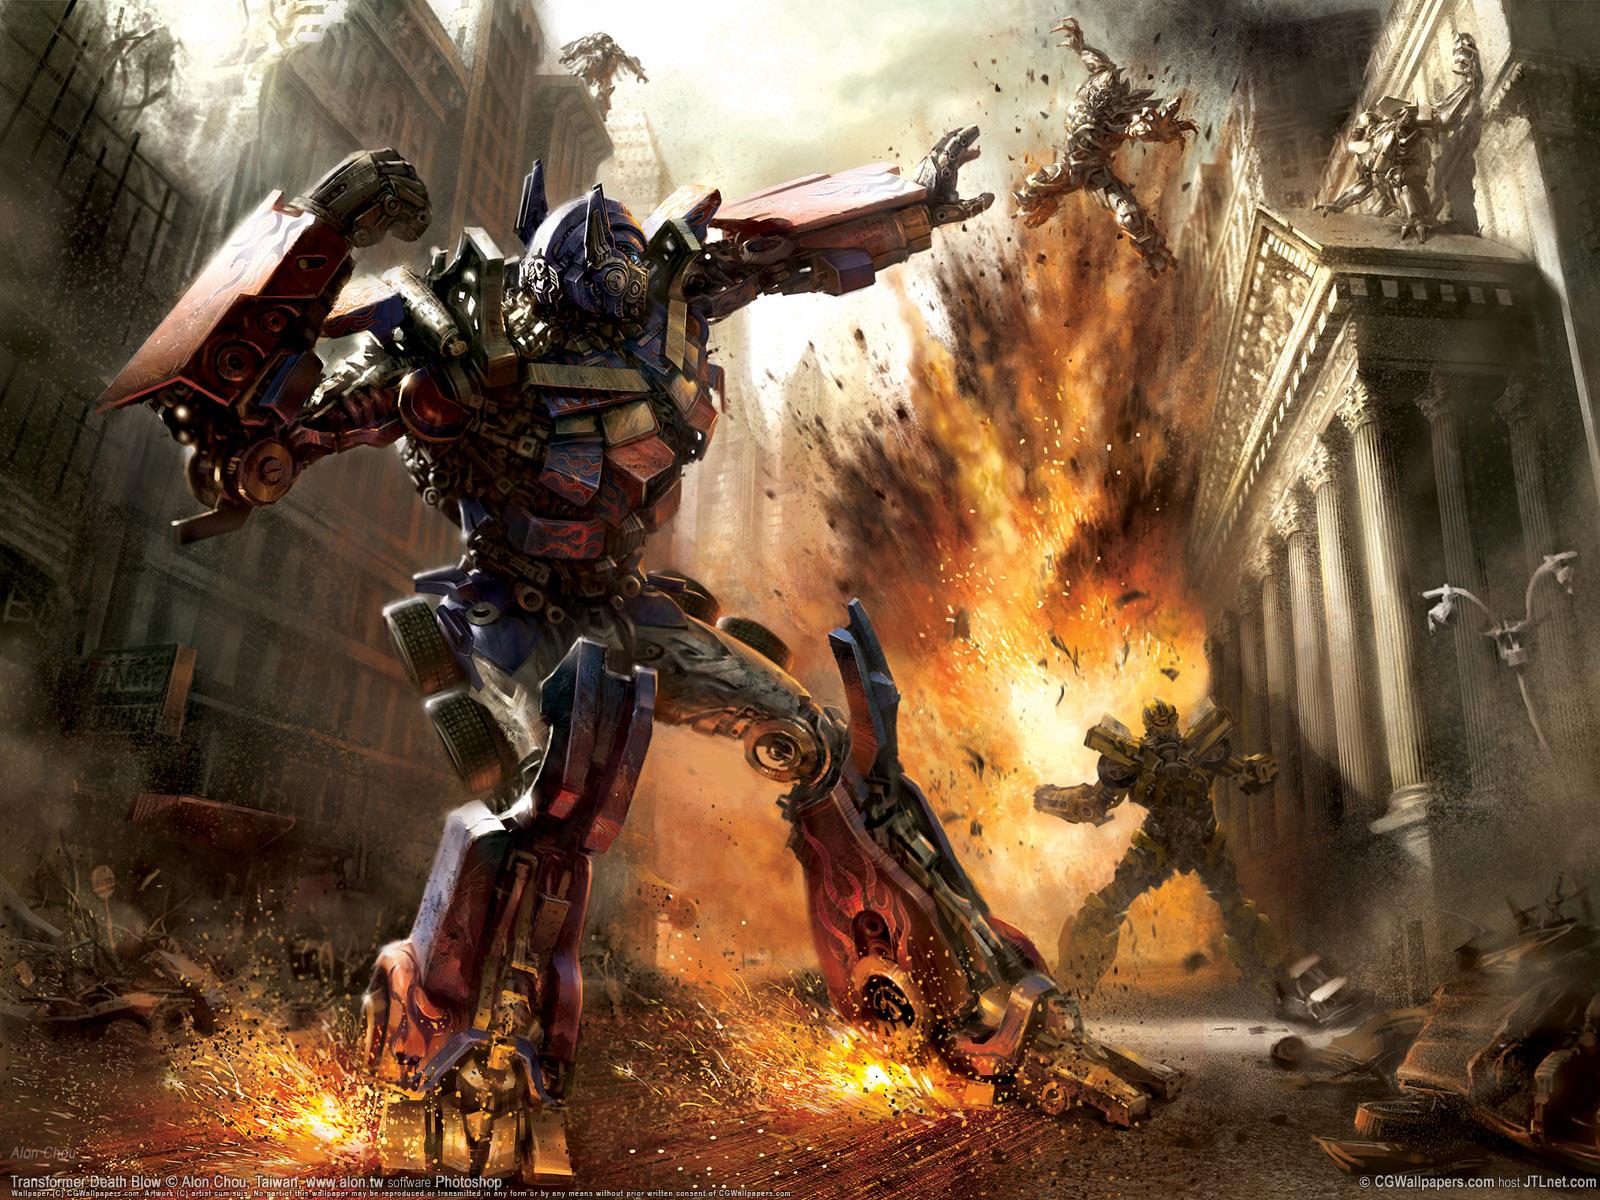 Download Transformers Wallpaper For Desktop 1600x1200